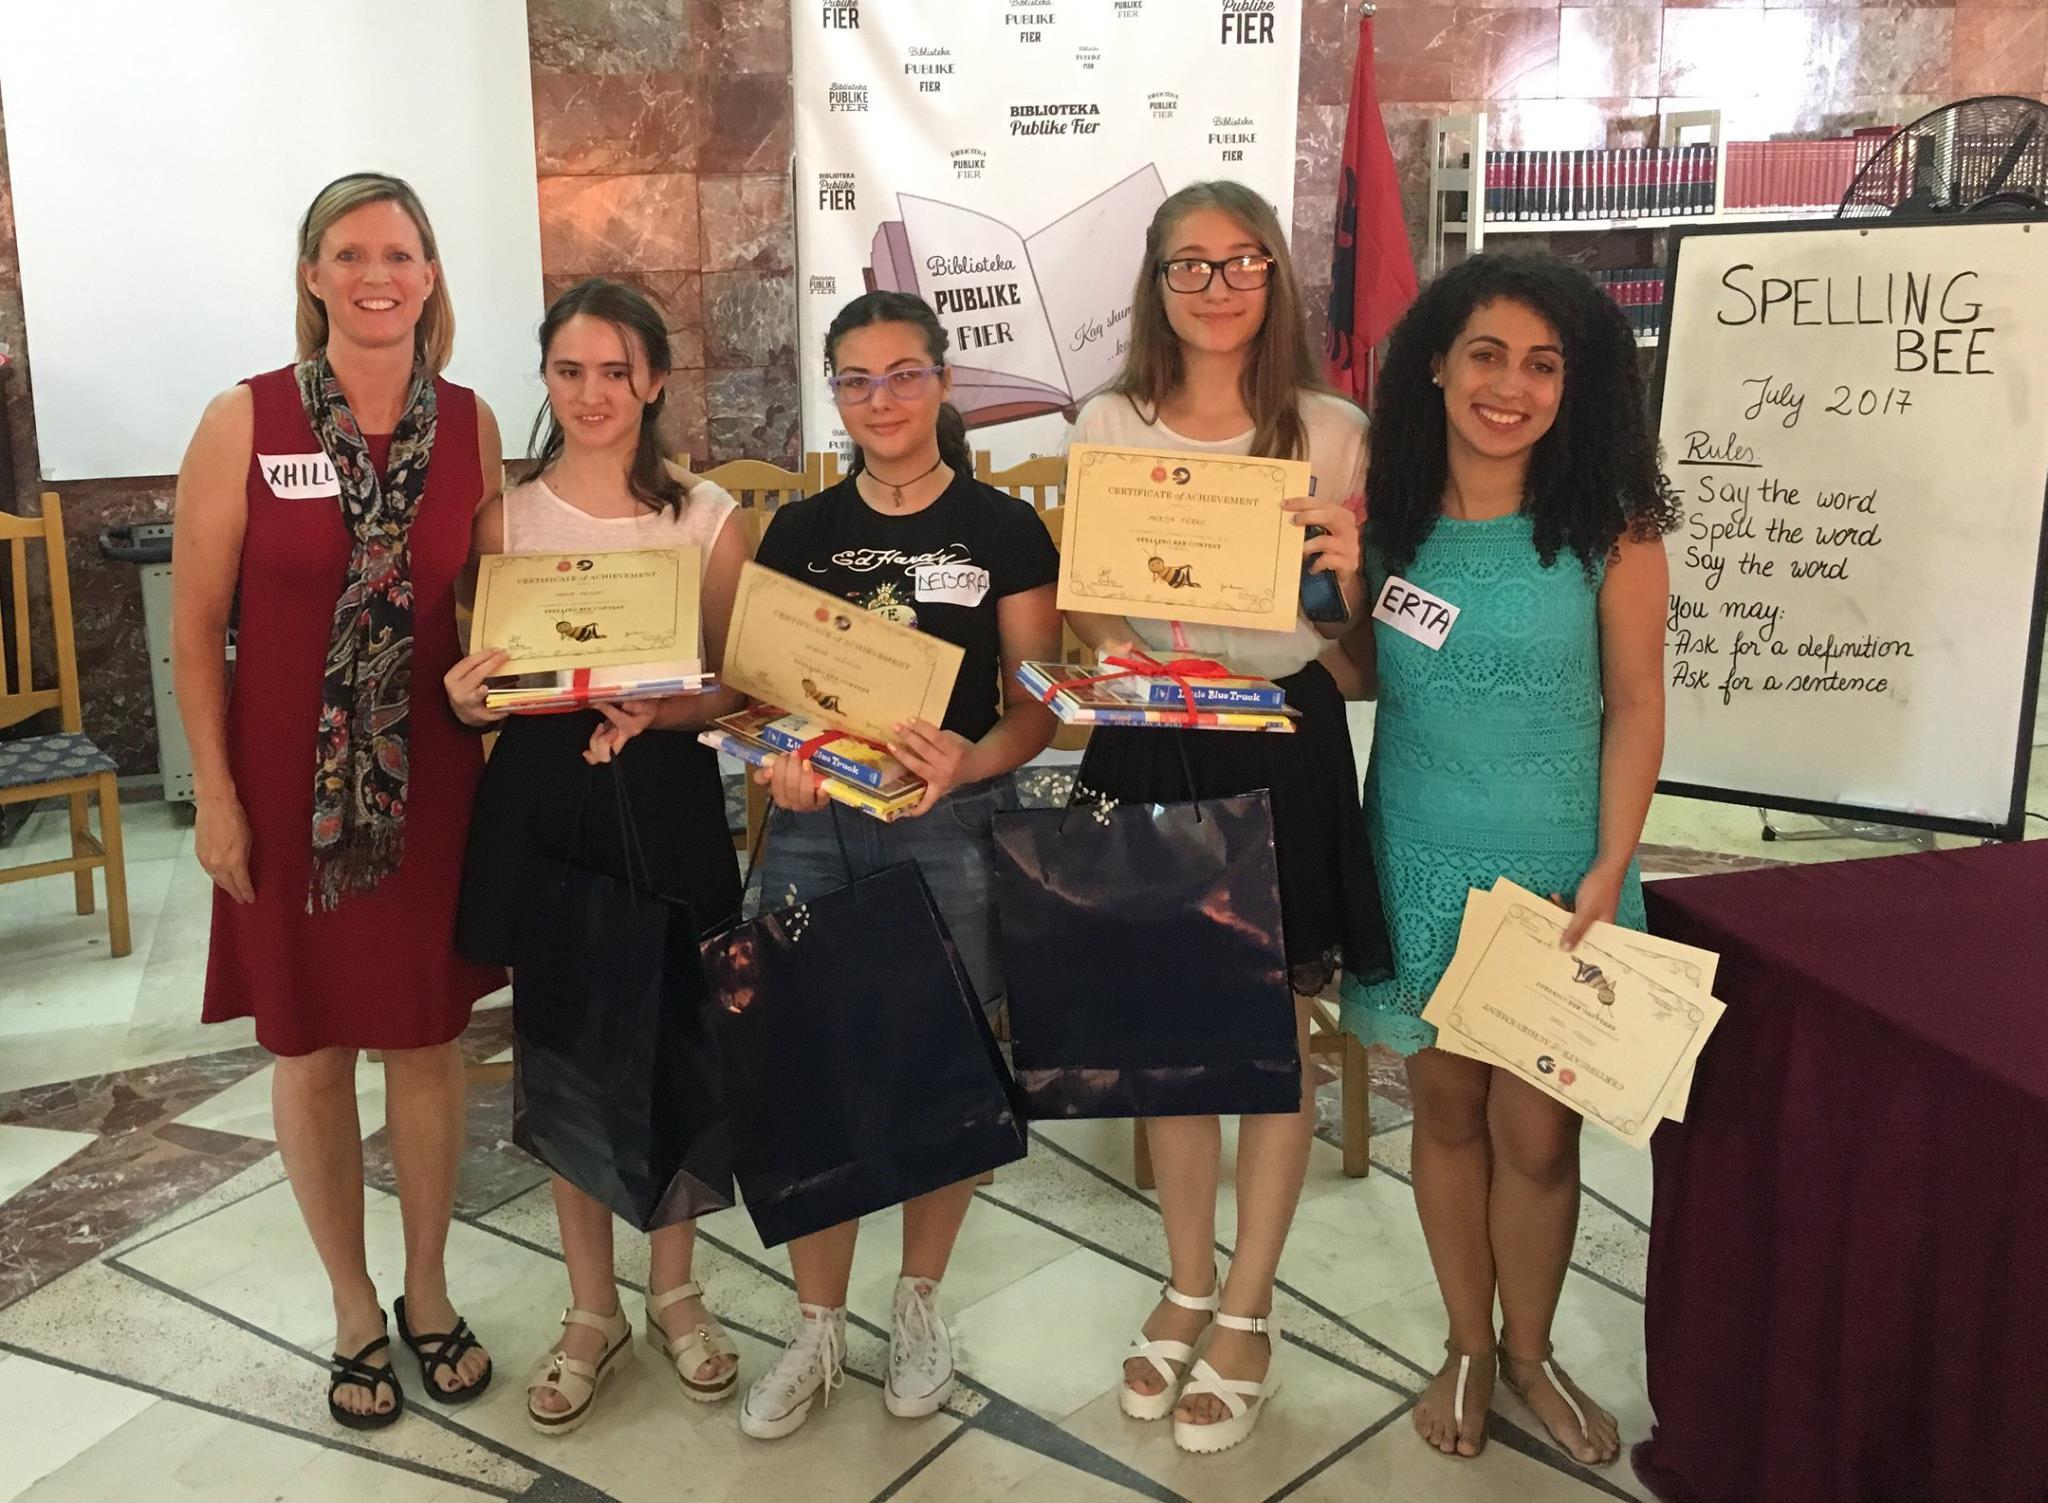 Erta Prifti And Spelling Bee Winners